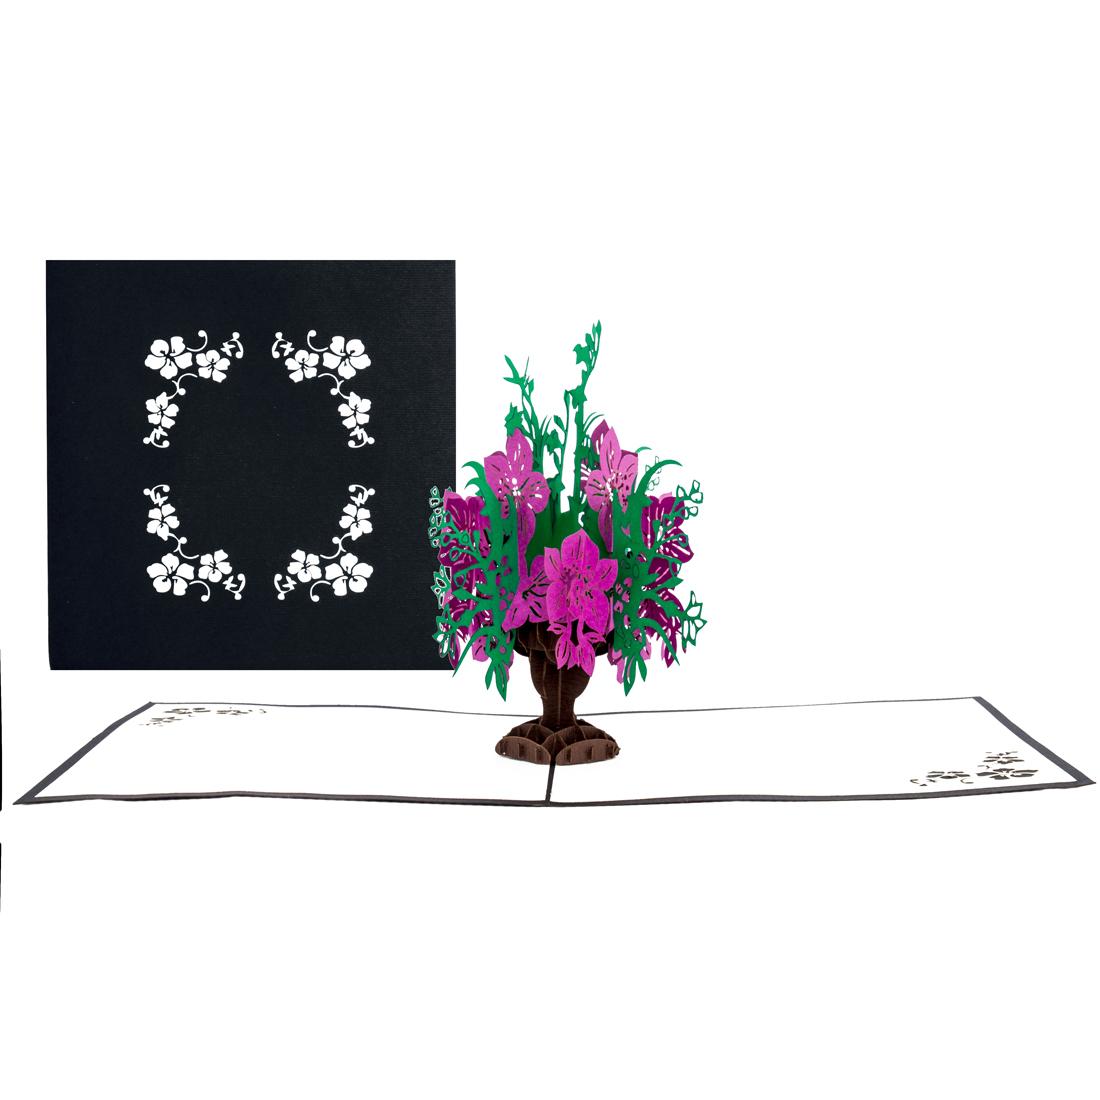 "Pop Up Karte ""Blumenbouquet"" - Blumenkarte, Geburtstagskarte, Genesungskarte, Dankeskarte"